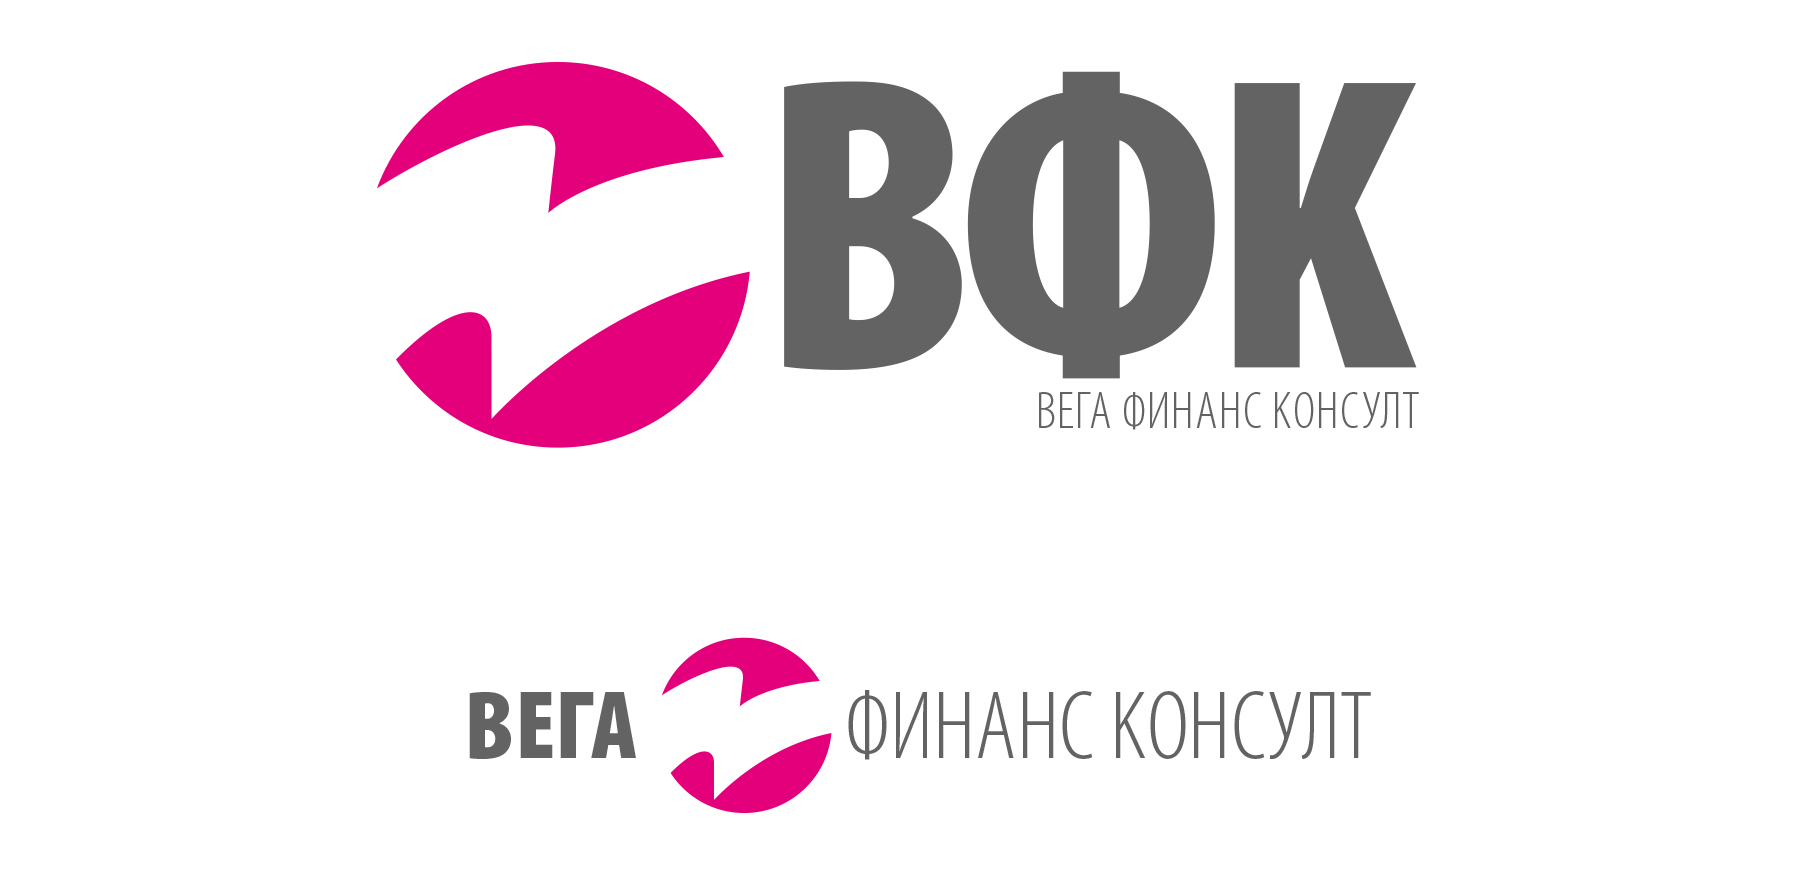 Cyrillic version